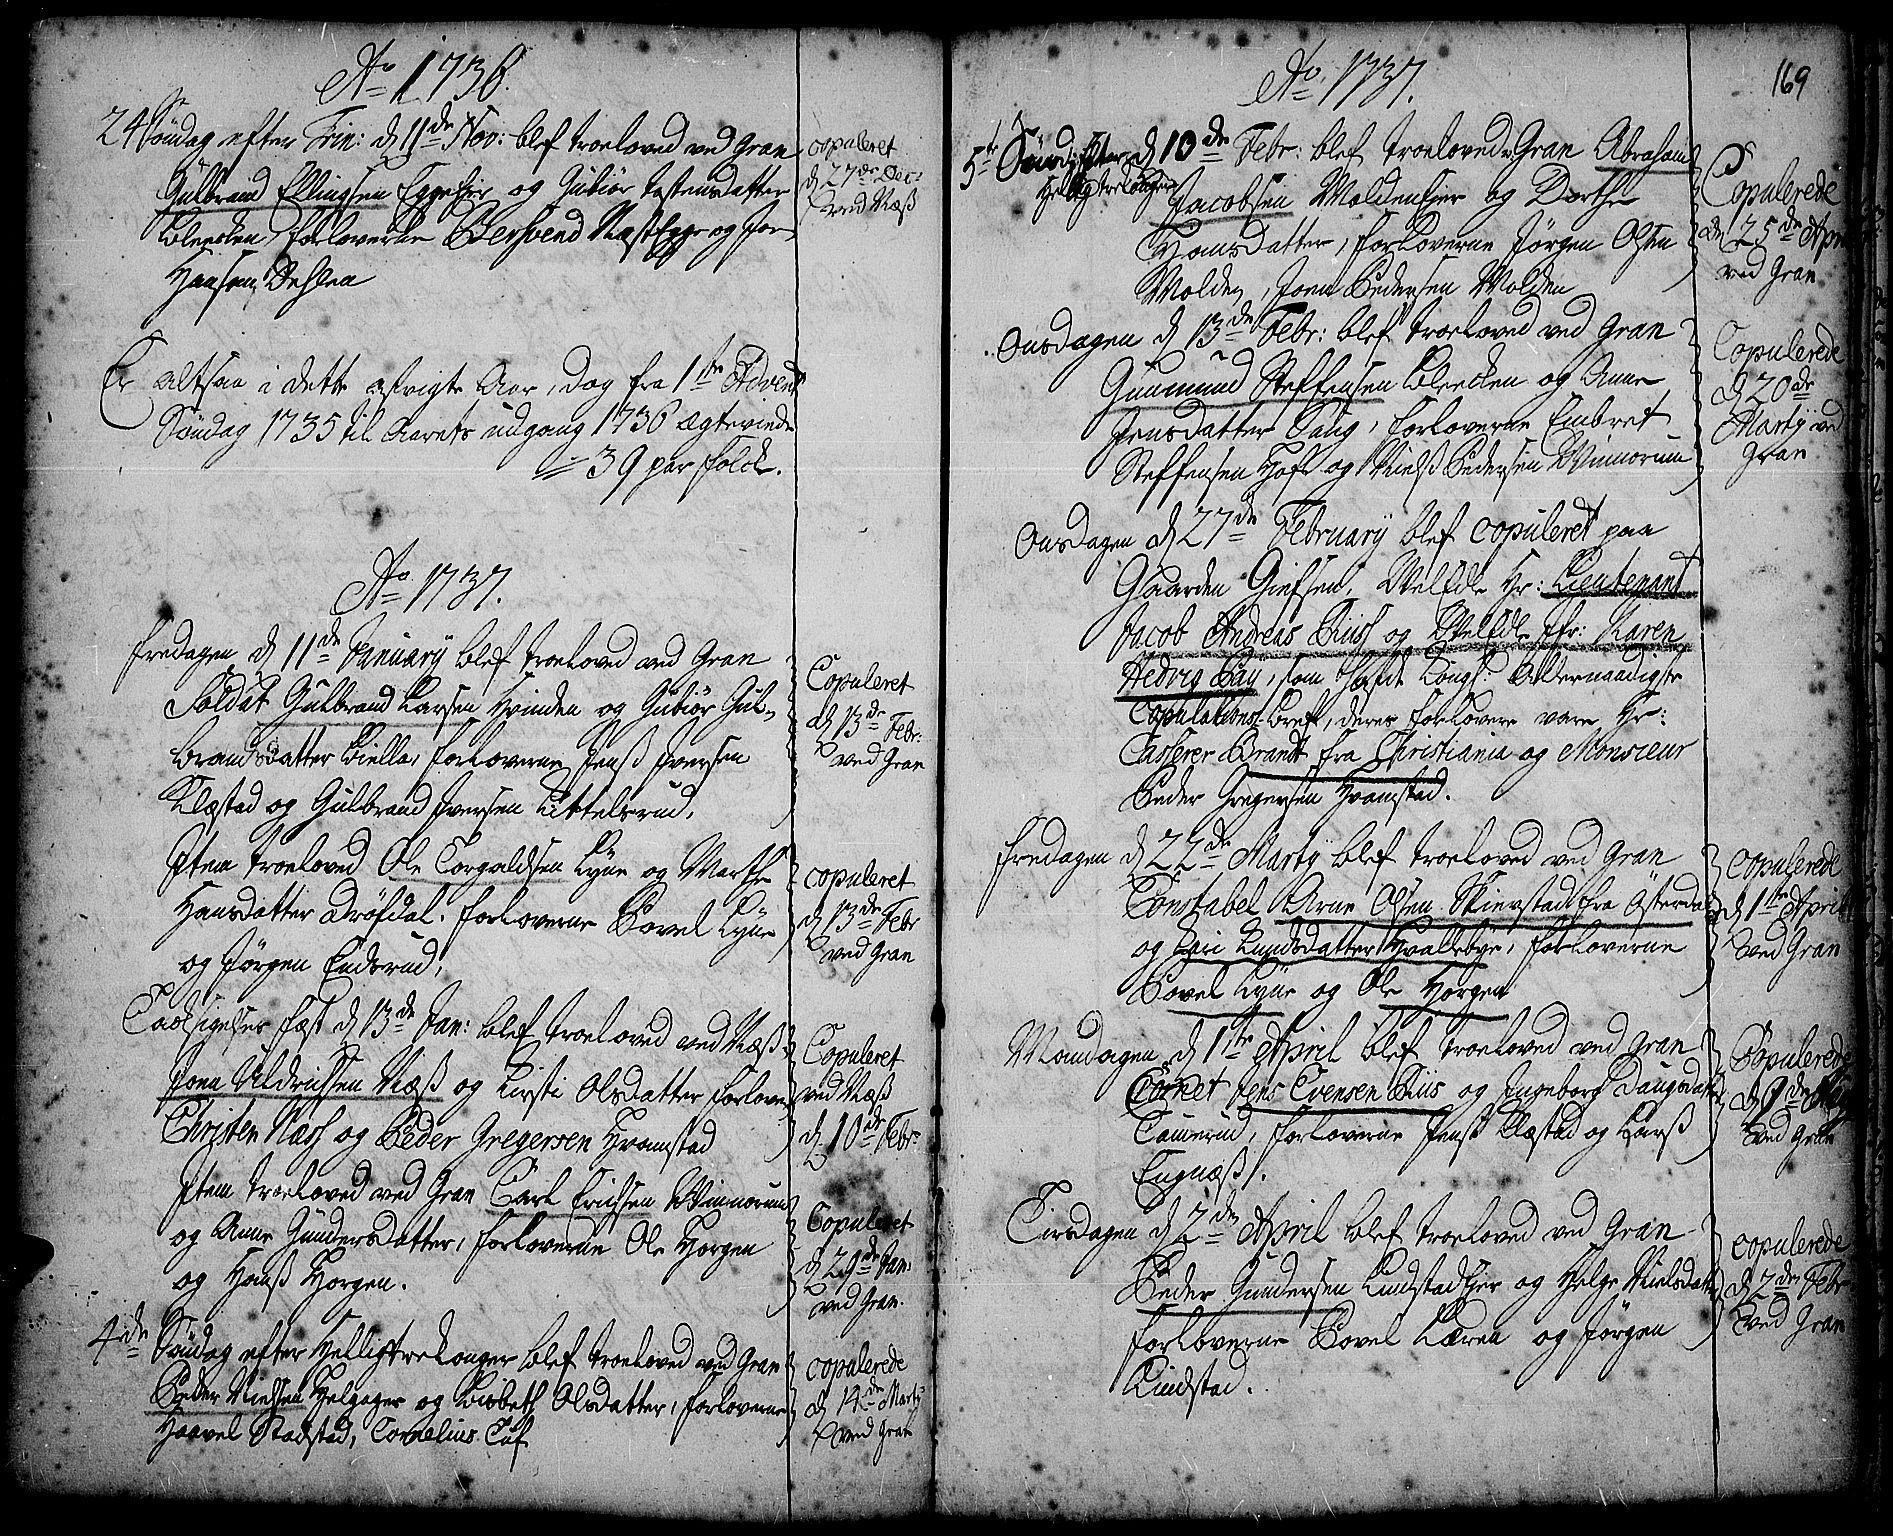 SAH, Gran prestekontor, Ministerialbok nr. 2, 1732-1744, s. 169